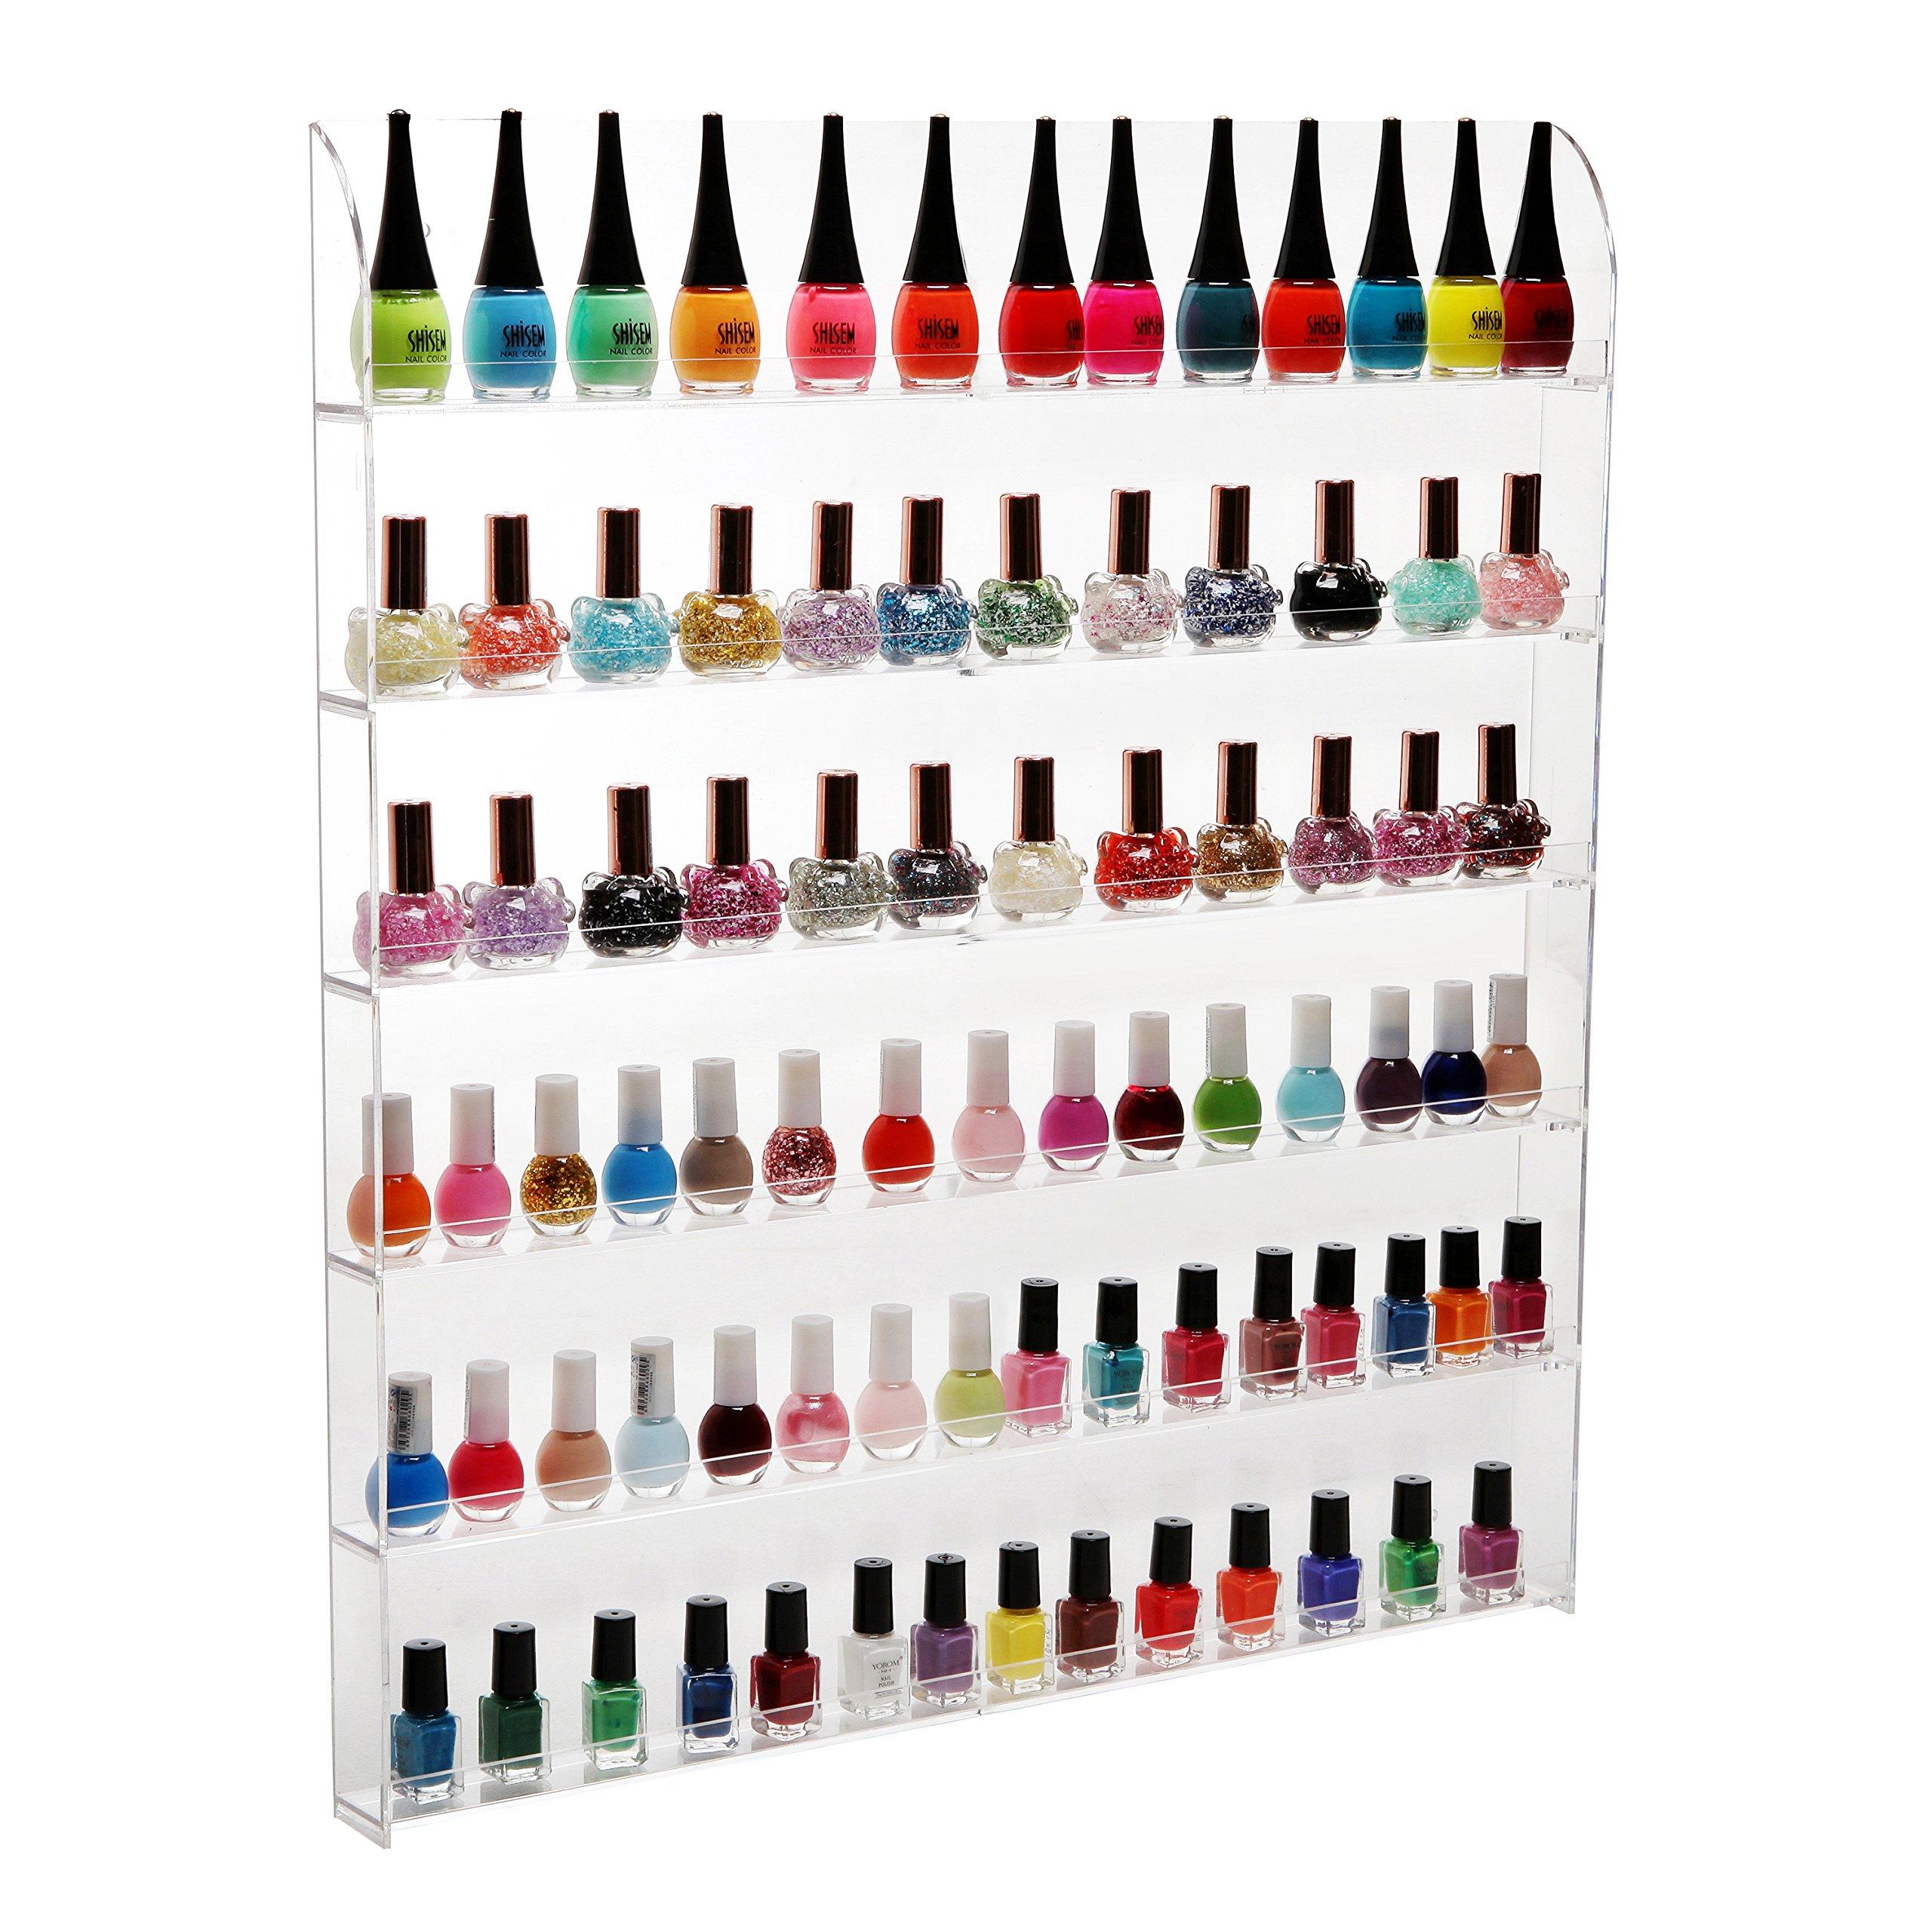 (102 Bottles) 6 Shelf Pro Clear Acrylic Nail Polish Rack / Salon Wall Mounted Organizer Display - MyGift